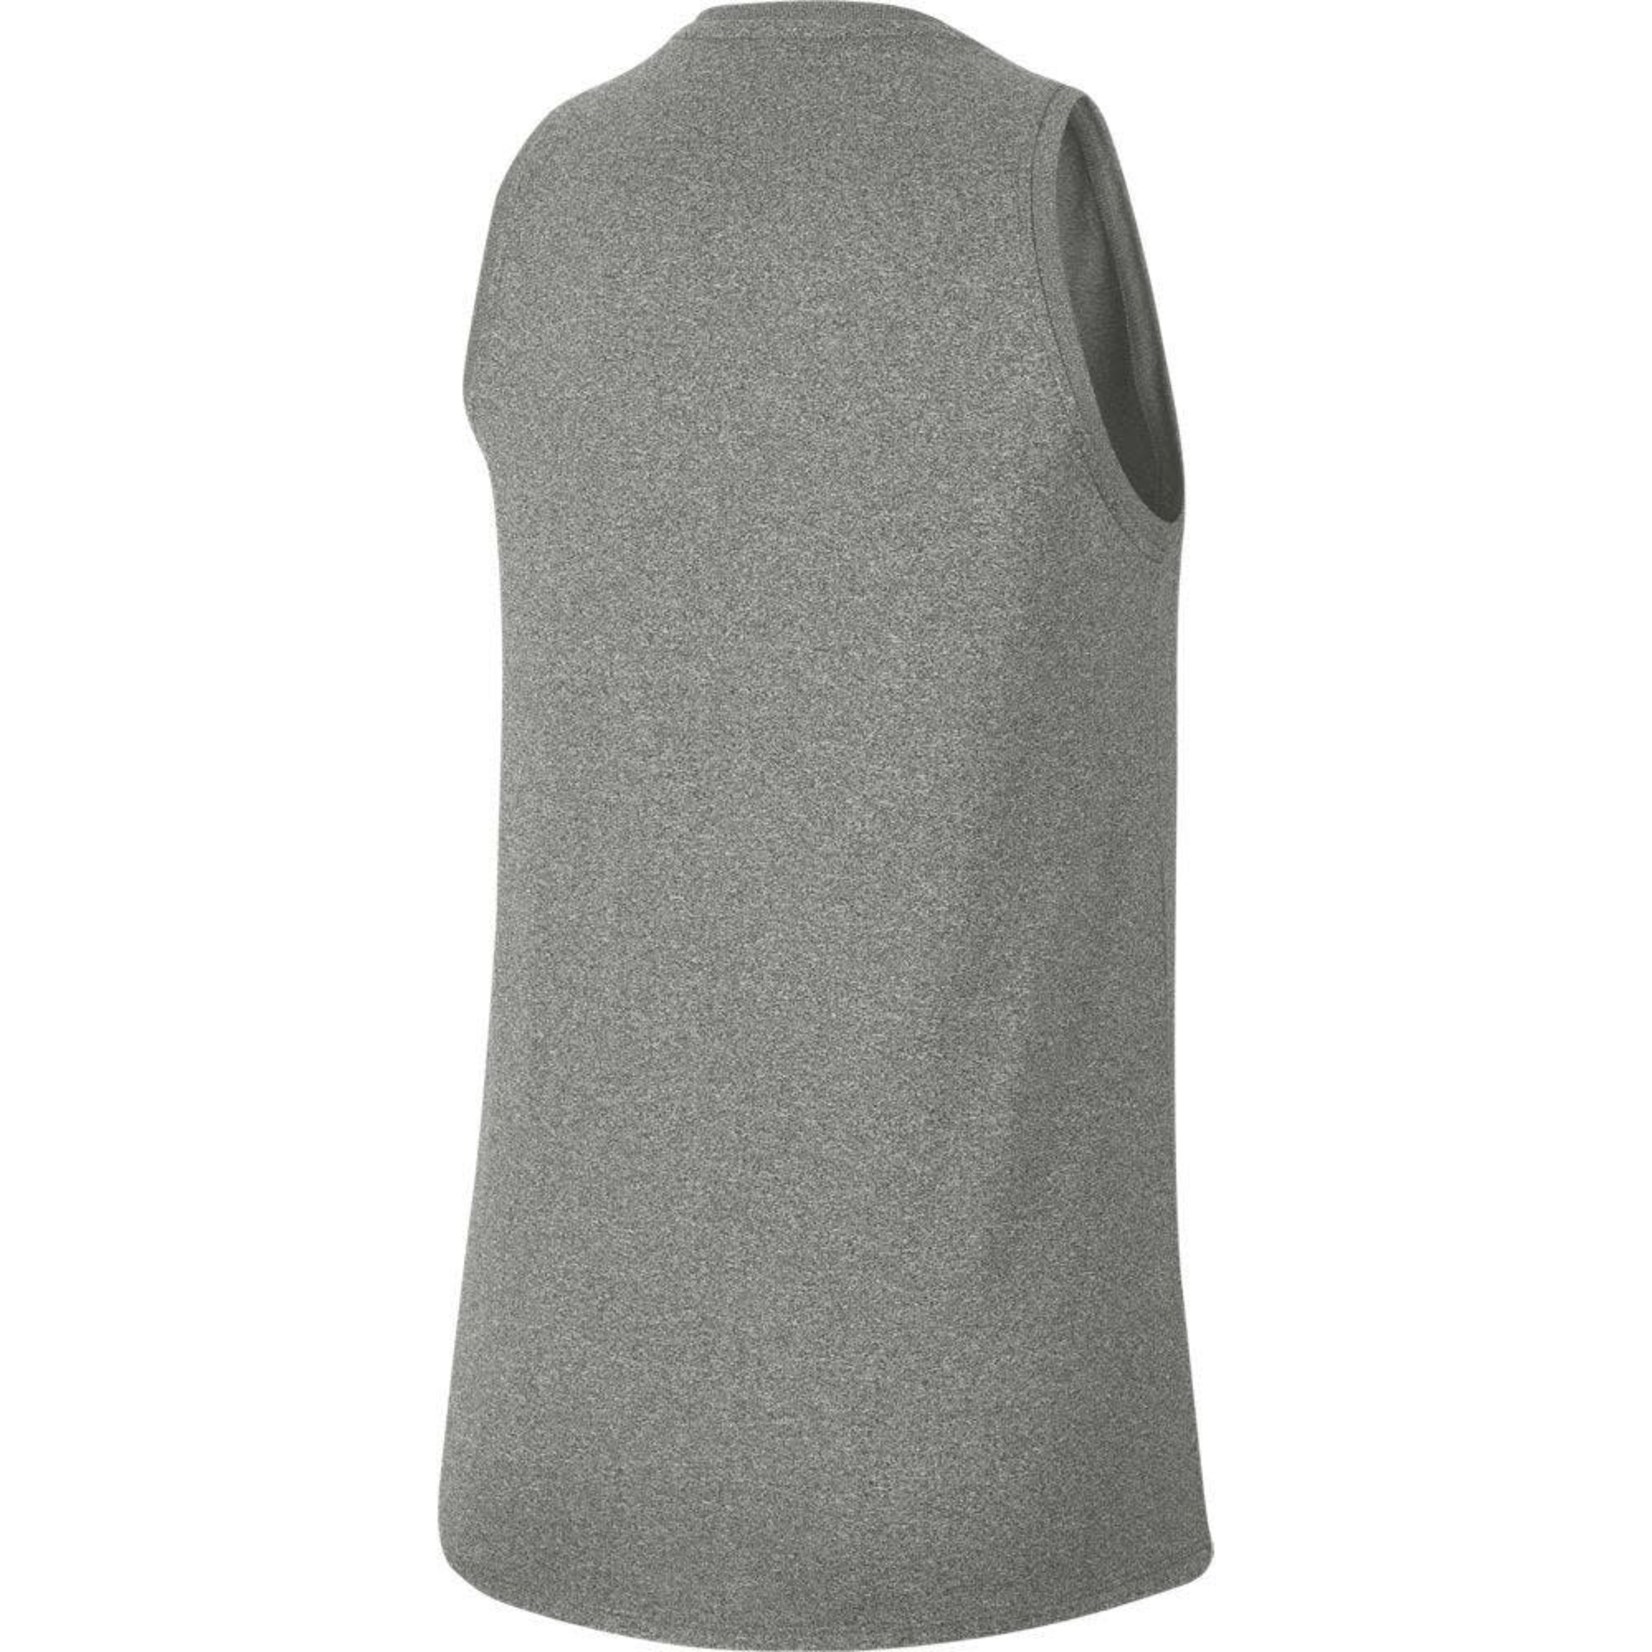 Nike Nike Tank, Dri-Fit Essential, Ladies